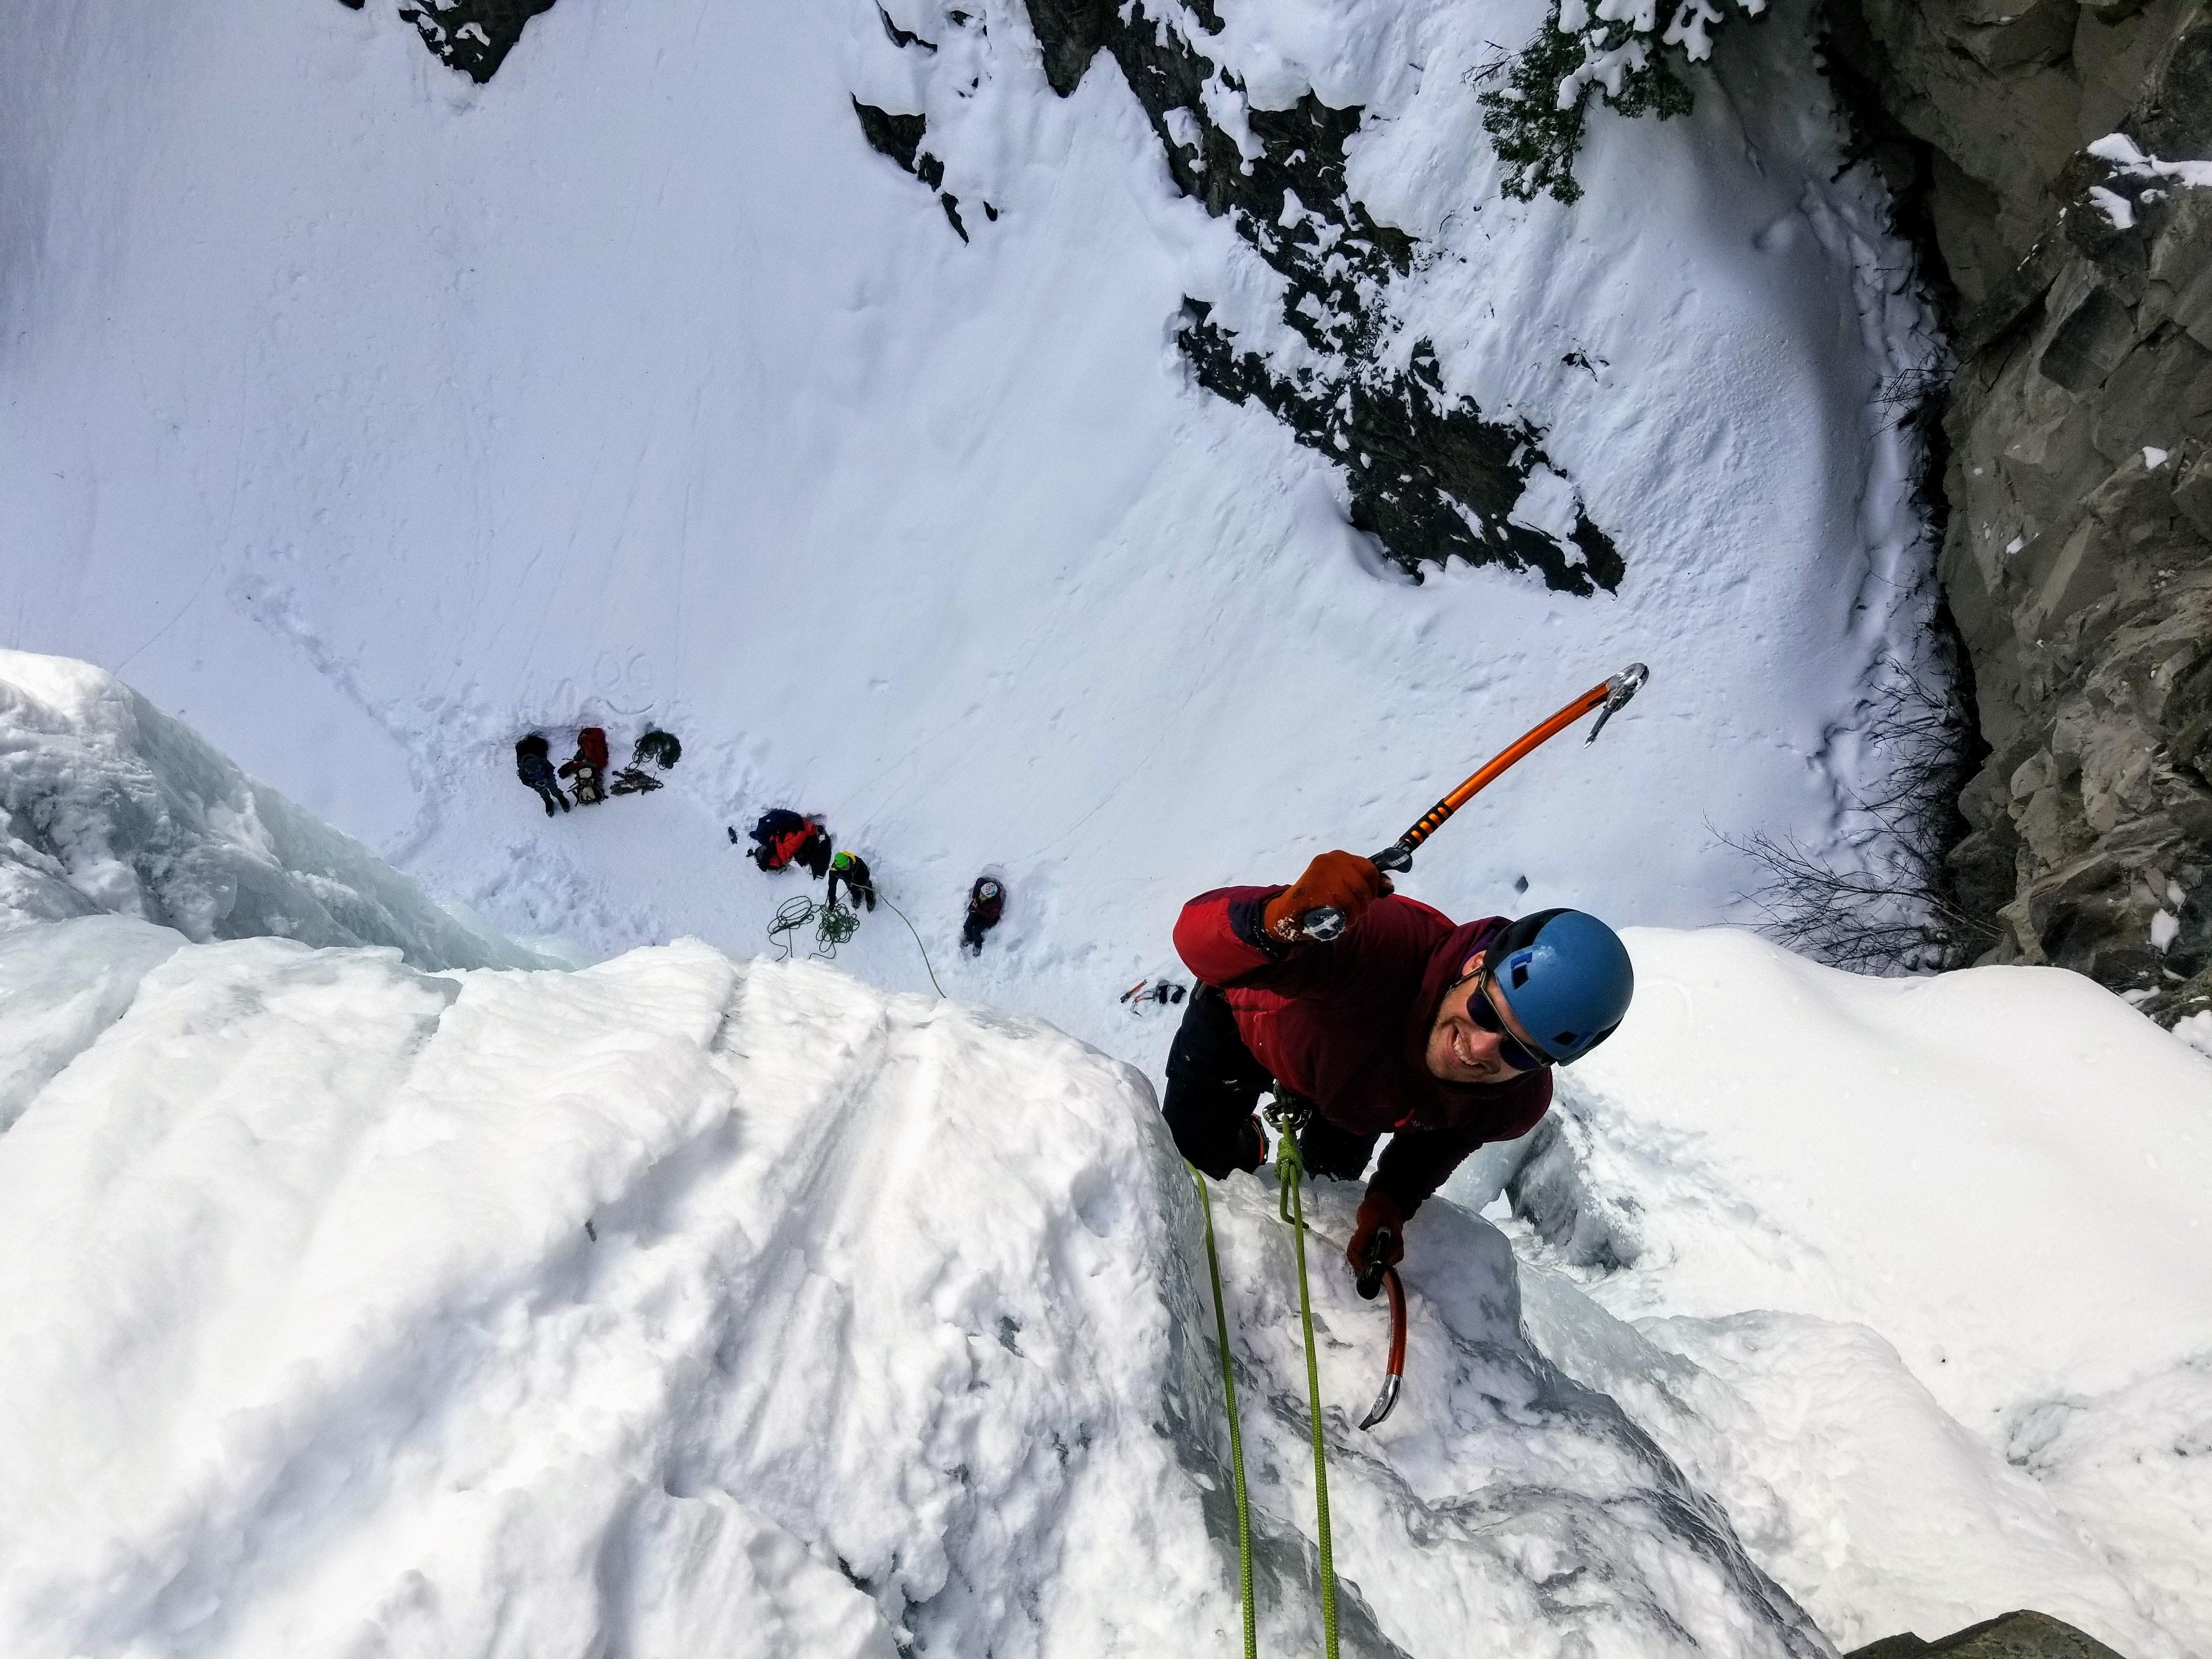 ice climb Europe adventure, zipline snowdonia wales adventure experience localbini biniblog travel adrenaline experiences Europe thrill local authentic